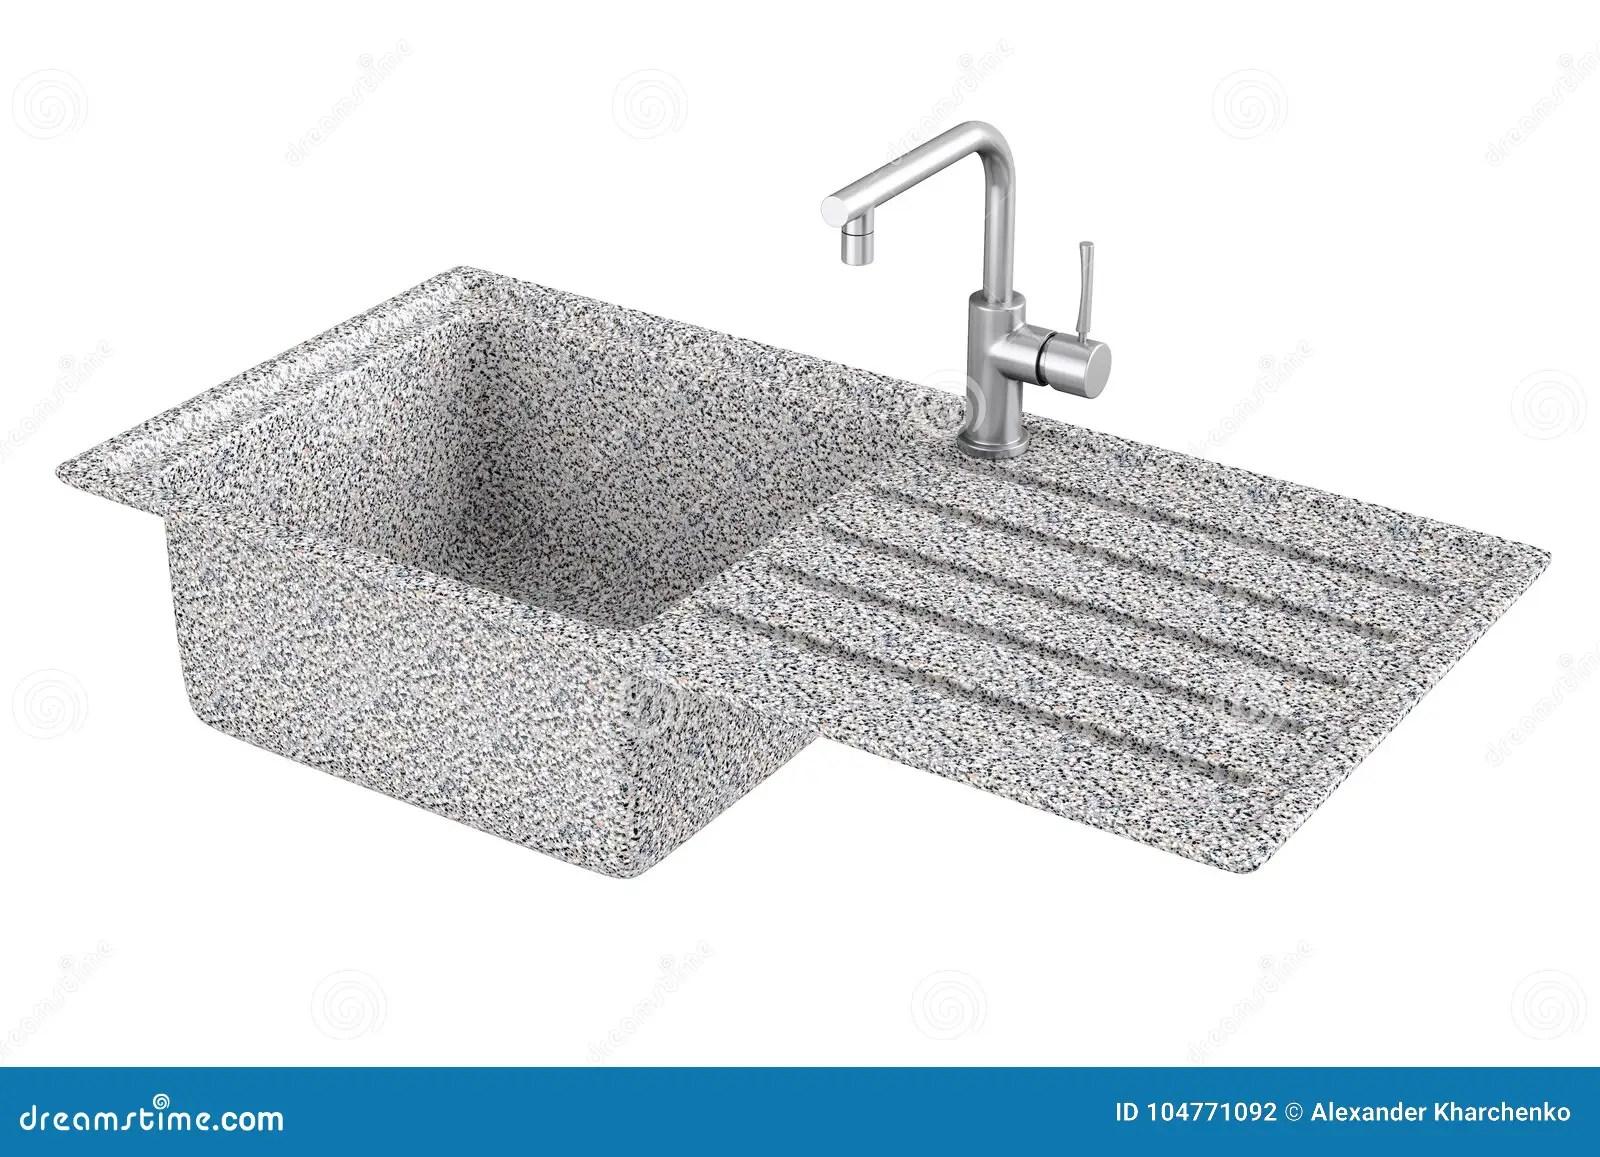 slate kitchen faucet hot water for sink 与不锈钢水龙头 fauc的现代花岗岩厨房水槽库存例证 插画包括有设计 fauc的现代花岗岩厨房水槽